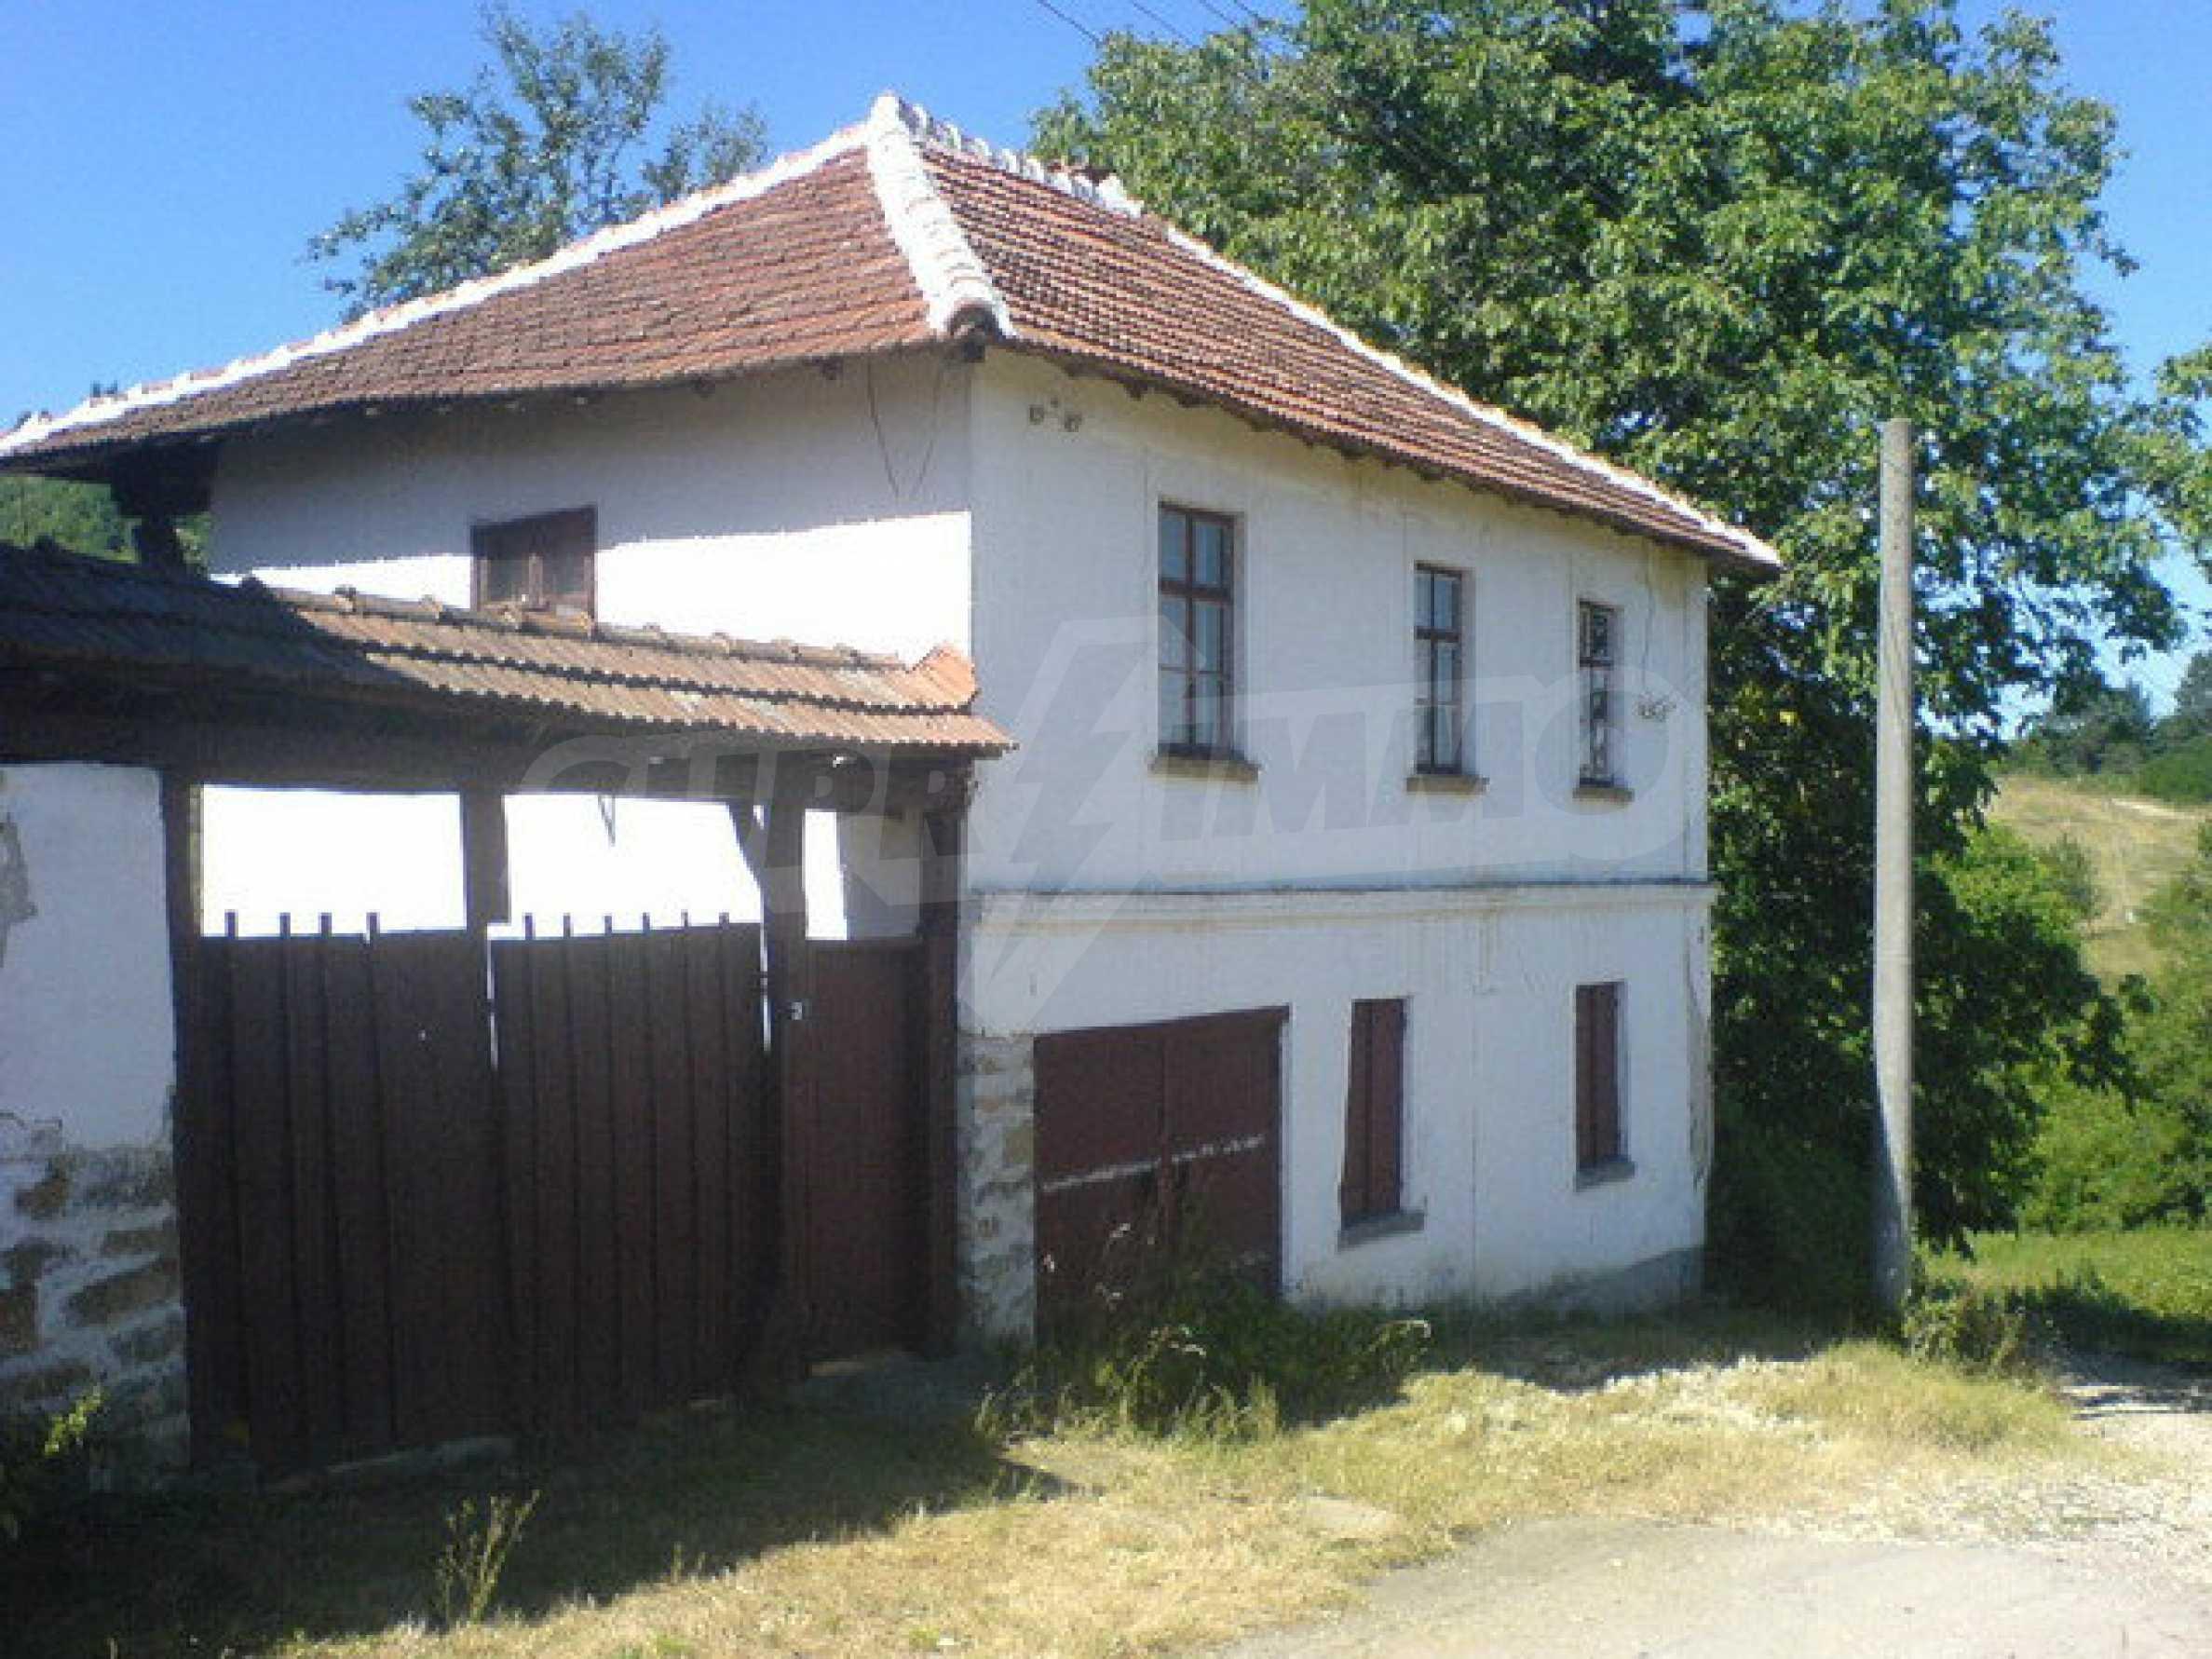 Haus mit Hof